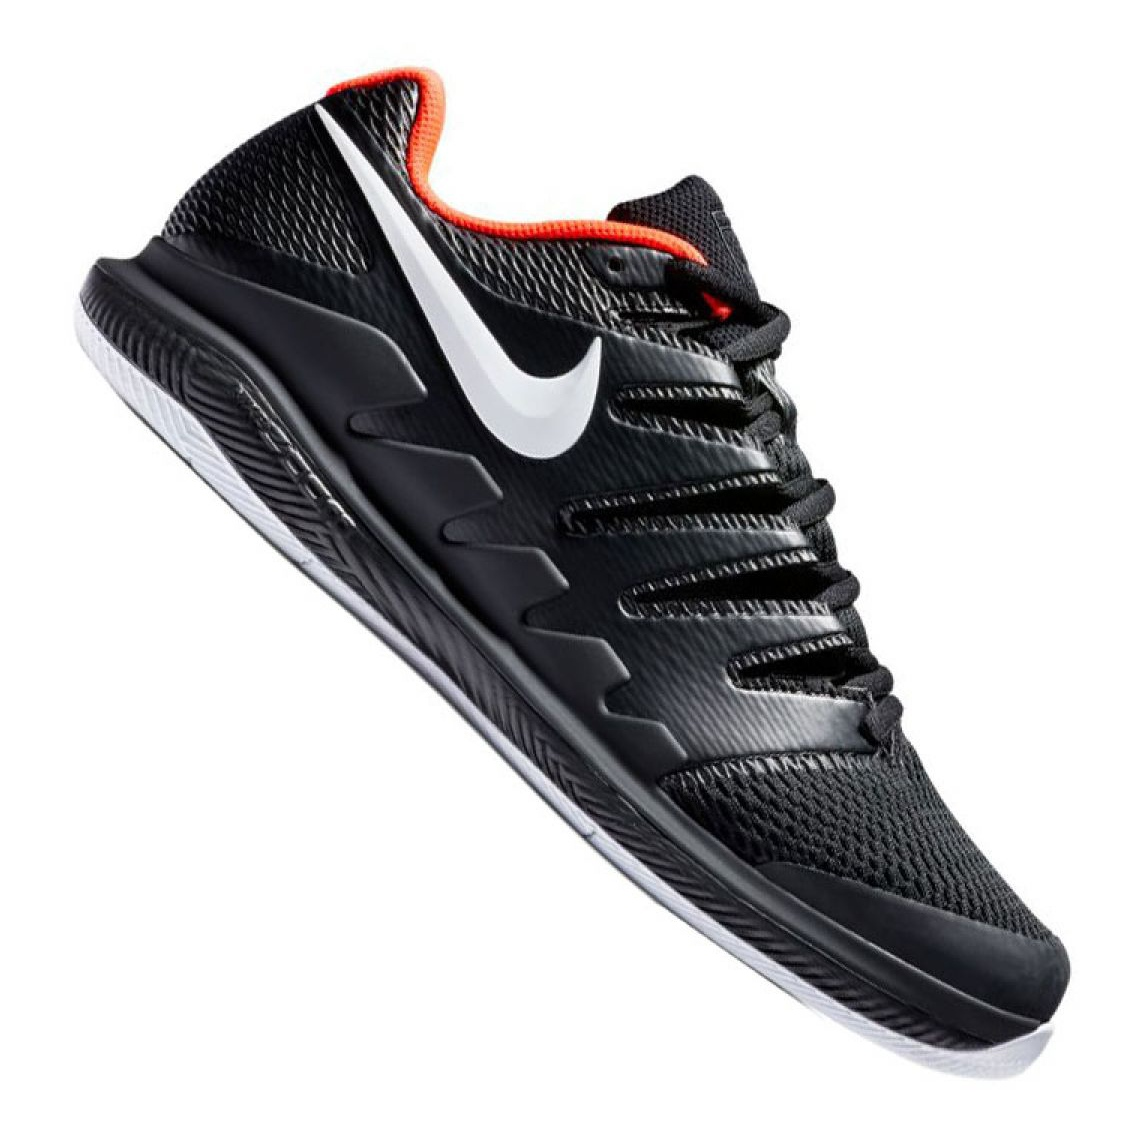 Sapatilhas de ténis de mulher Air Zoom Vapor X Nike